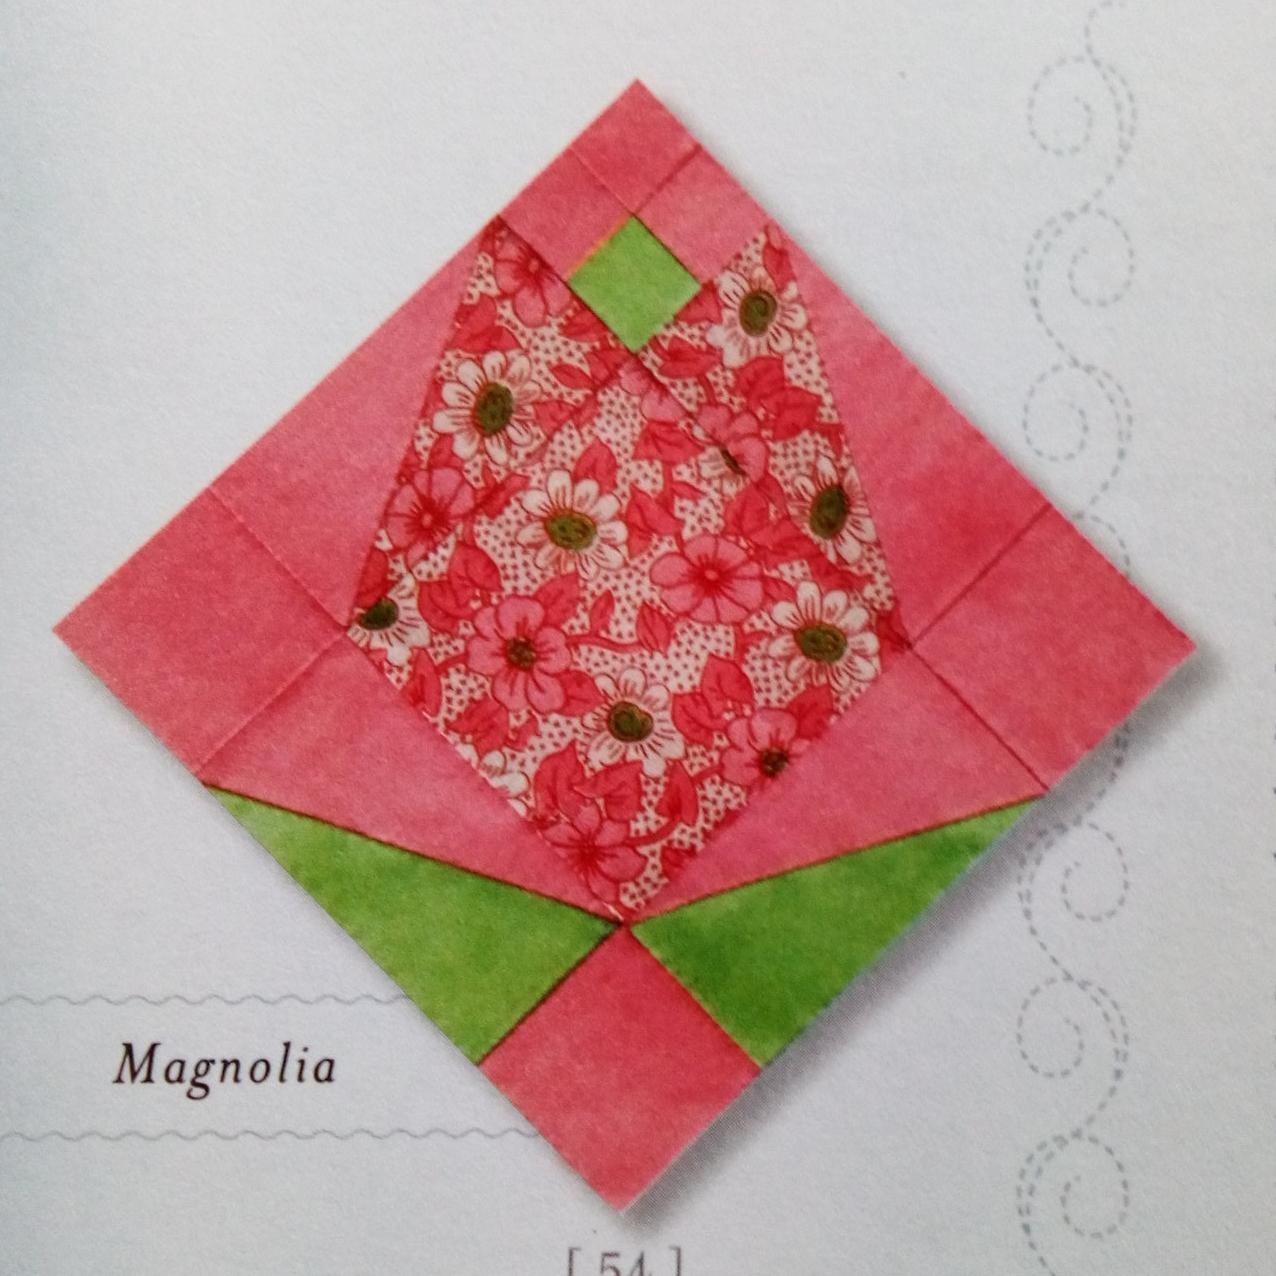 Magnolia: Coming November 16